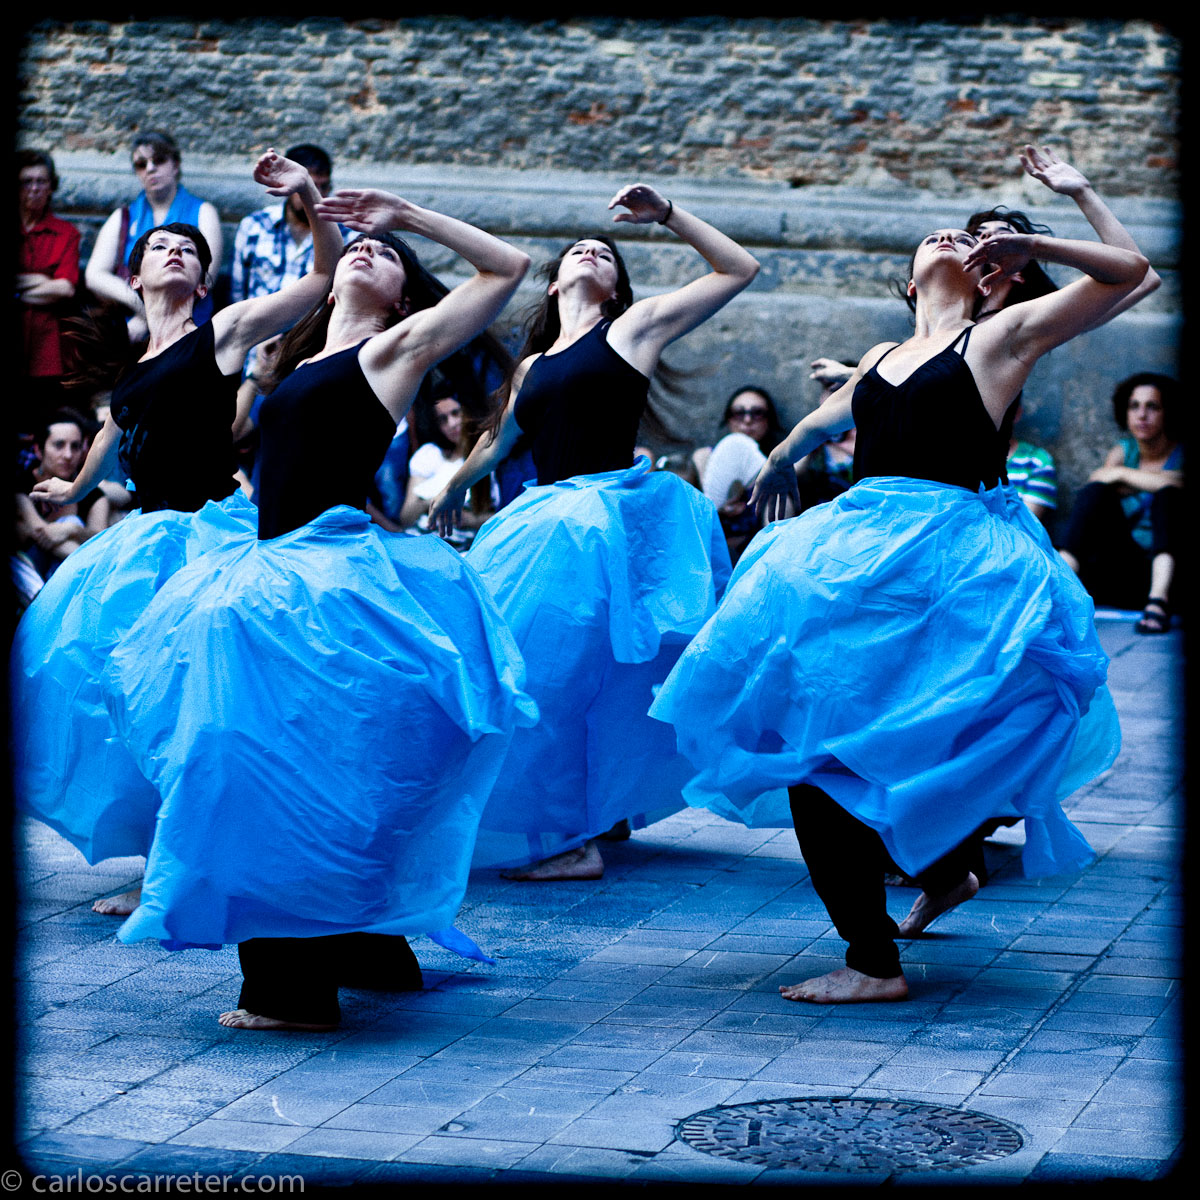 Taller de Danza y Arquitectura (Pza. San Felipe)